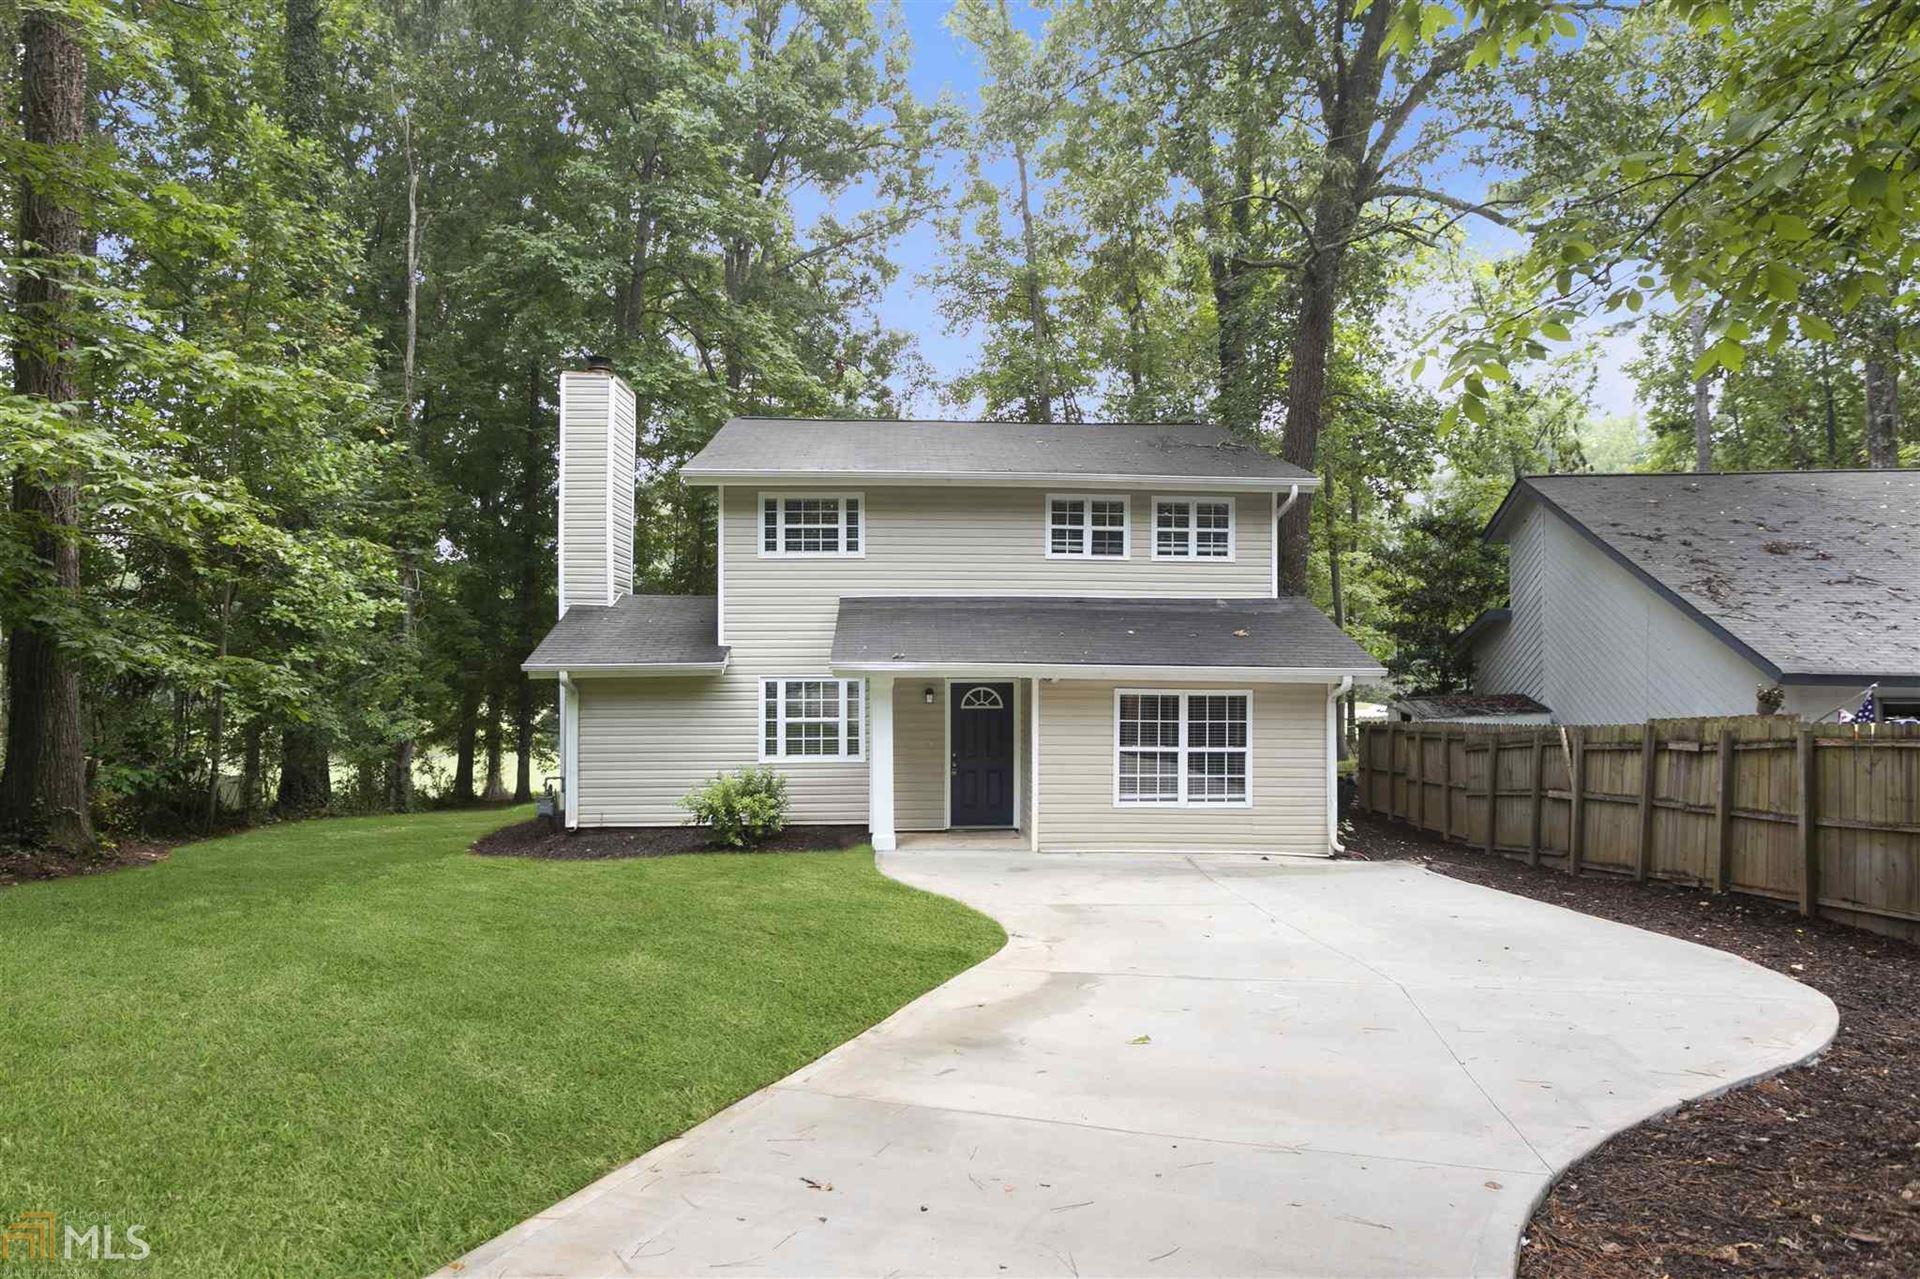 9 Ironwood Ct, Newnan, GA 30265 - MLS#: 8836352